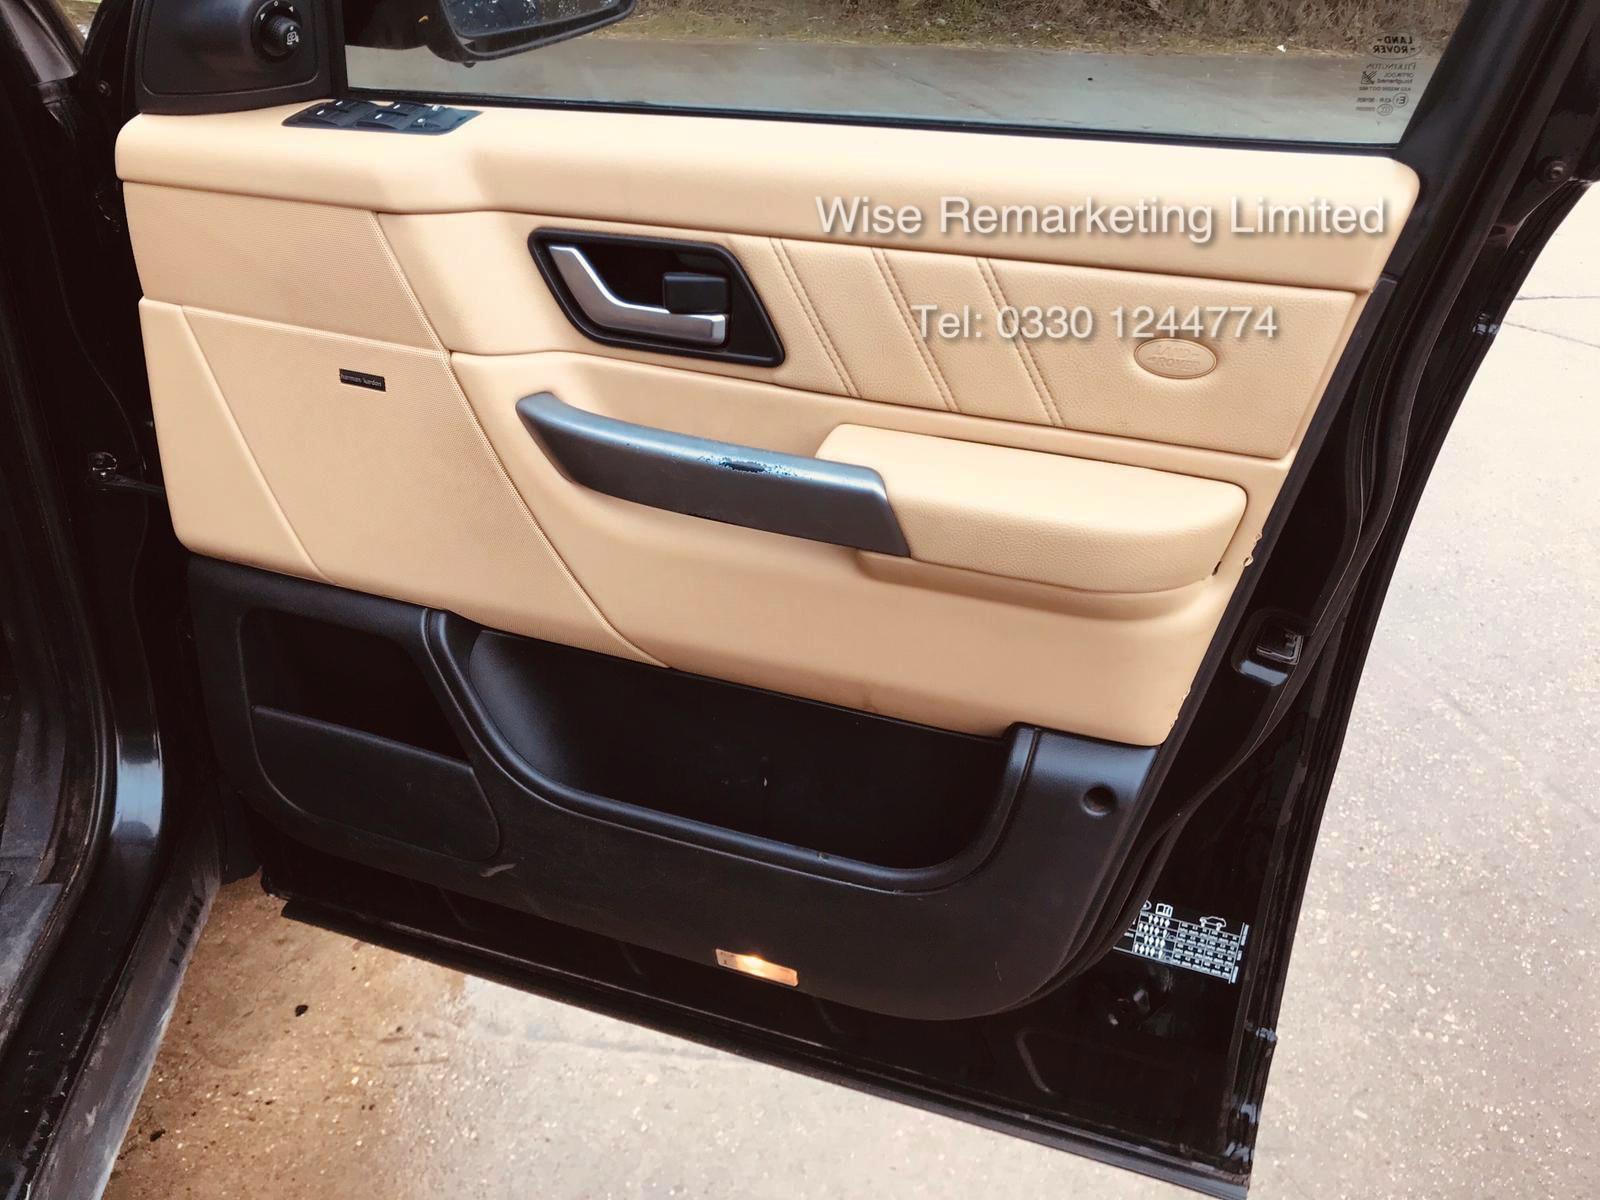 Range Rover Sport 2.7 TDV6 HSE Auto - 2008 Model - Cream Leather - Sat Nav - Heated Seats - Image 13 of 19